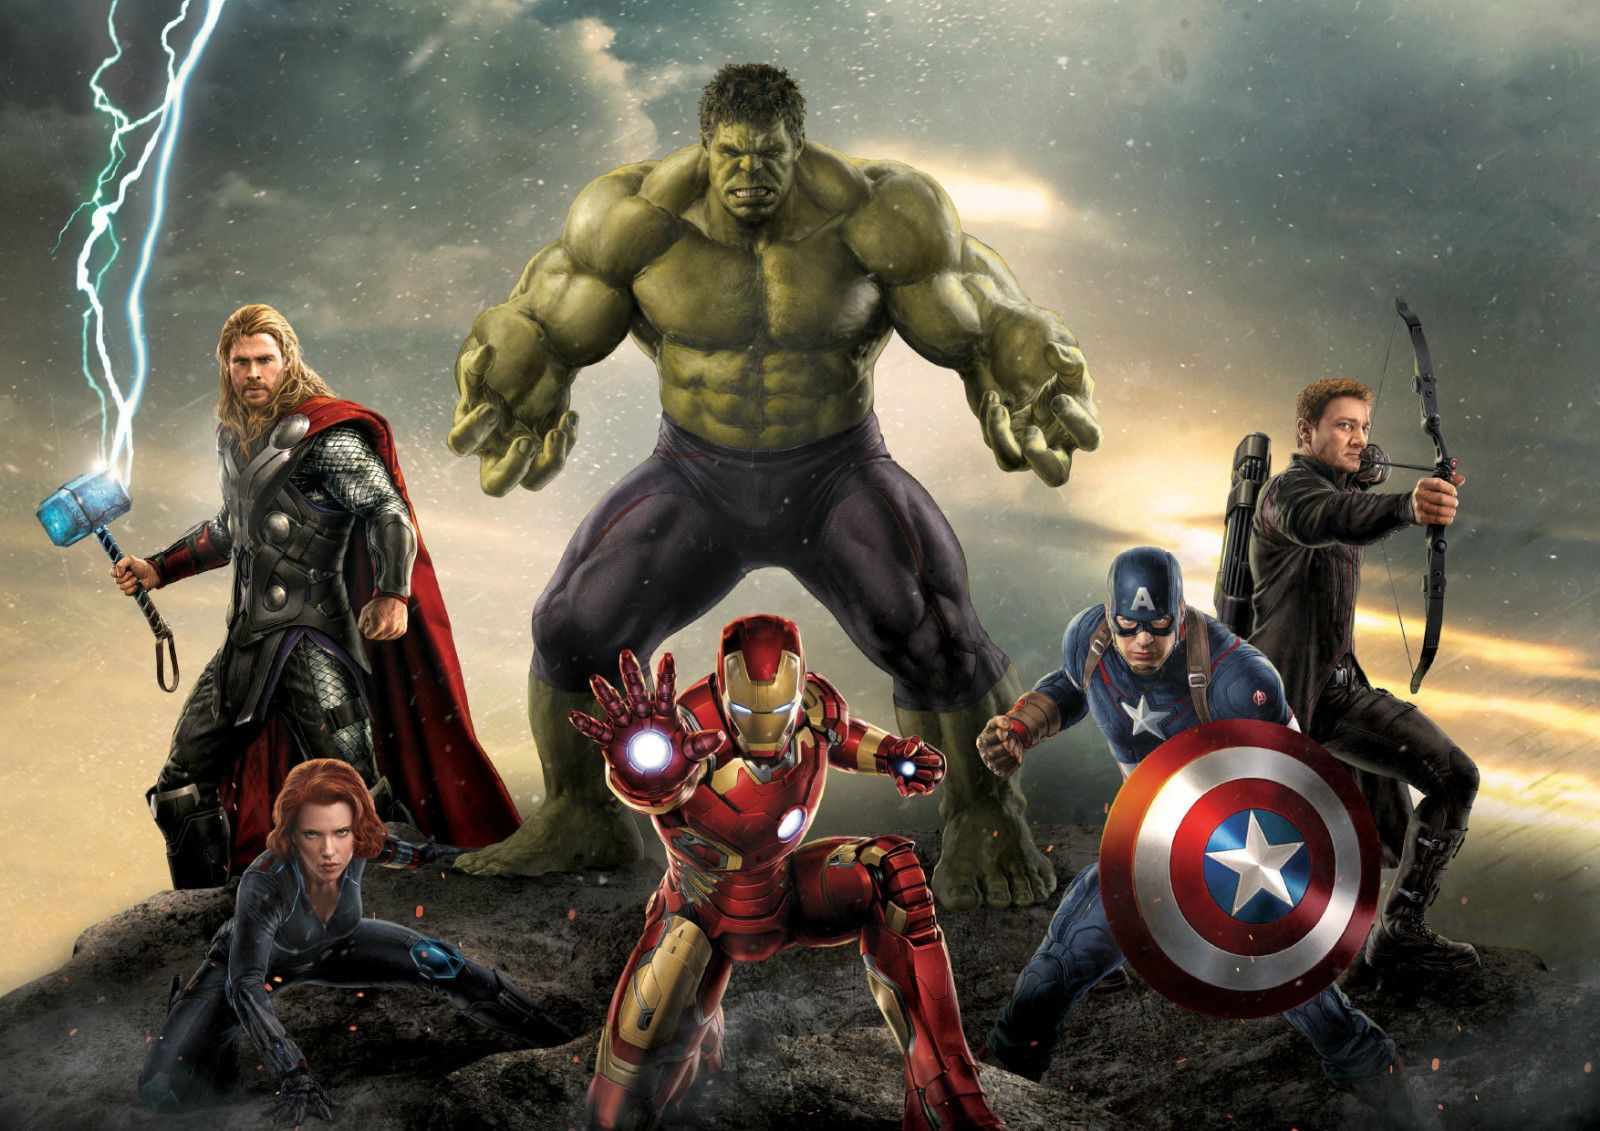 The Avengers Hulk Marvel Digital Art Poster Print T1721 A4 A3 A2 A1 A0|